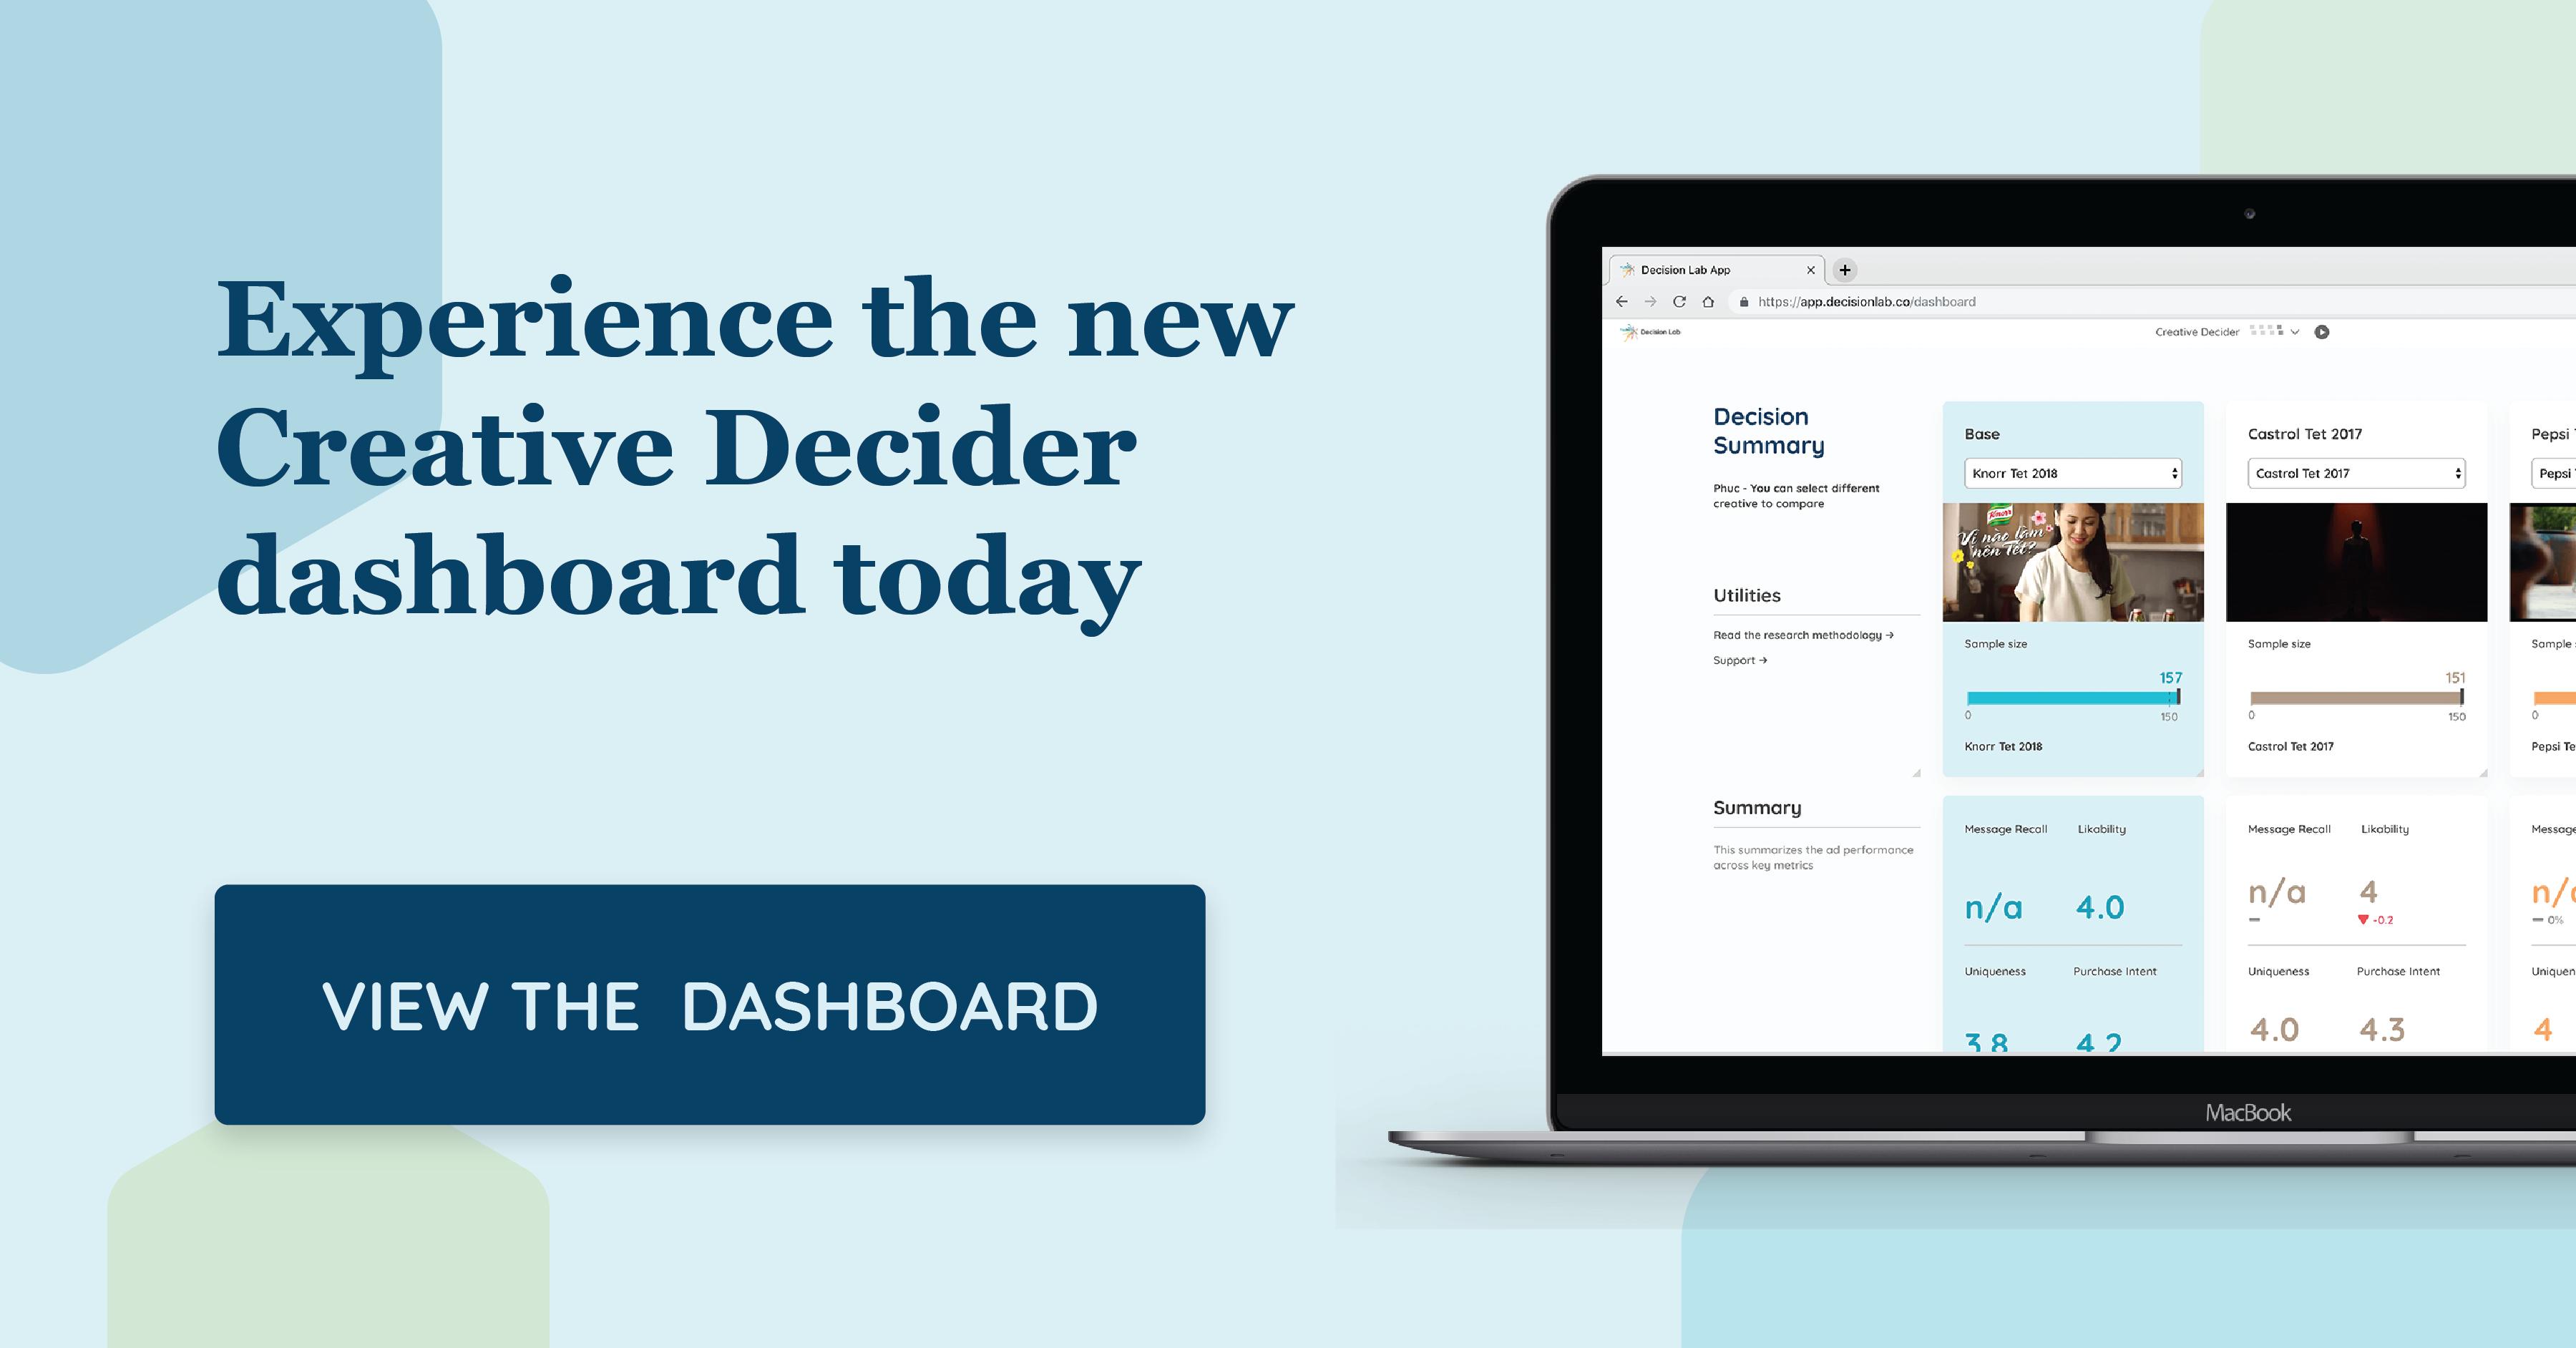 CRDR - Creative Decider - Tet 2018 Dashboard